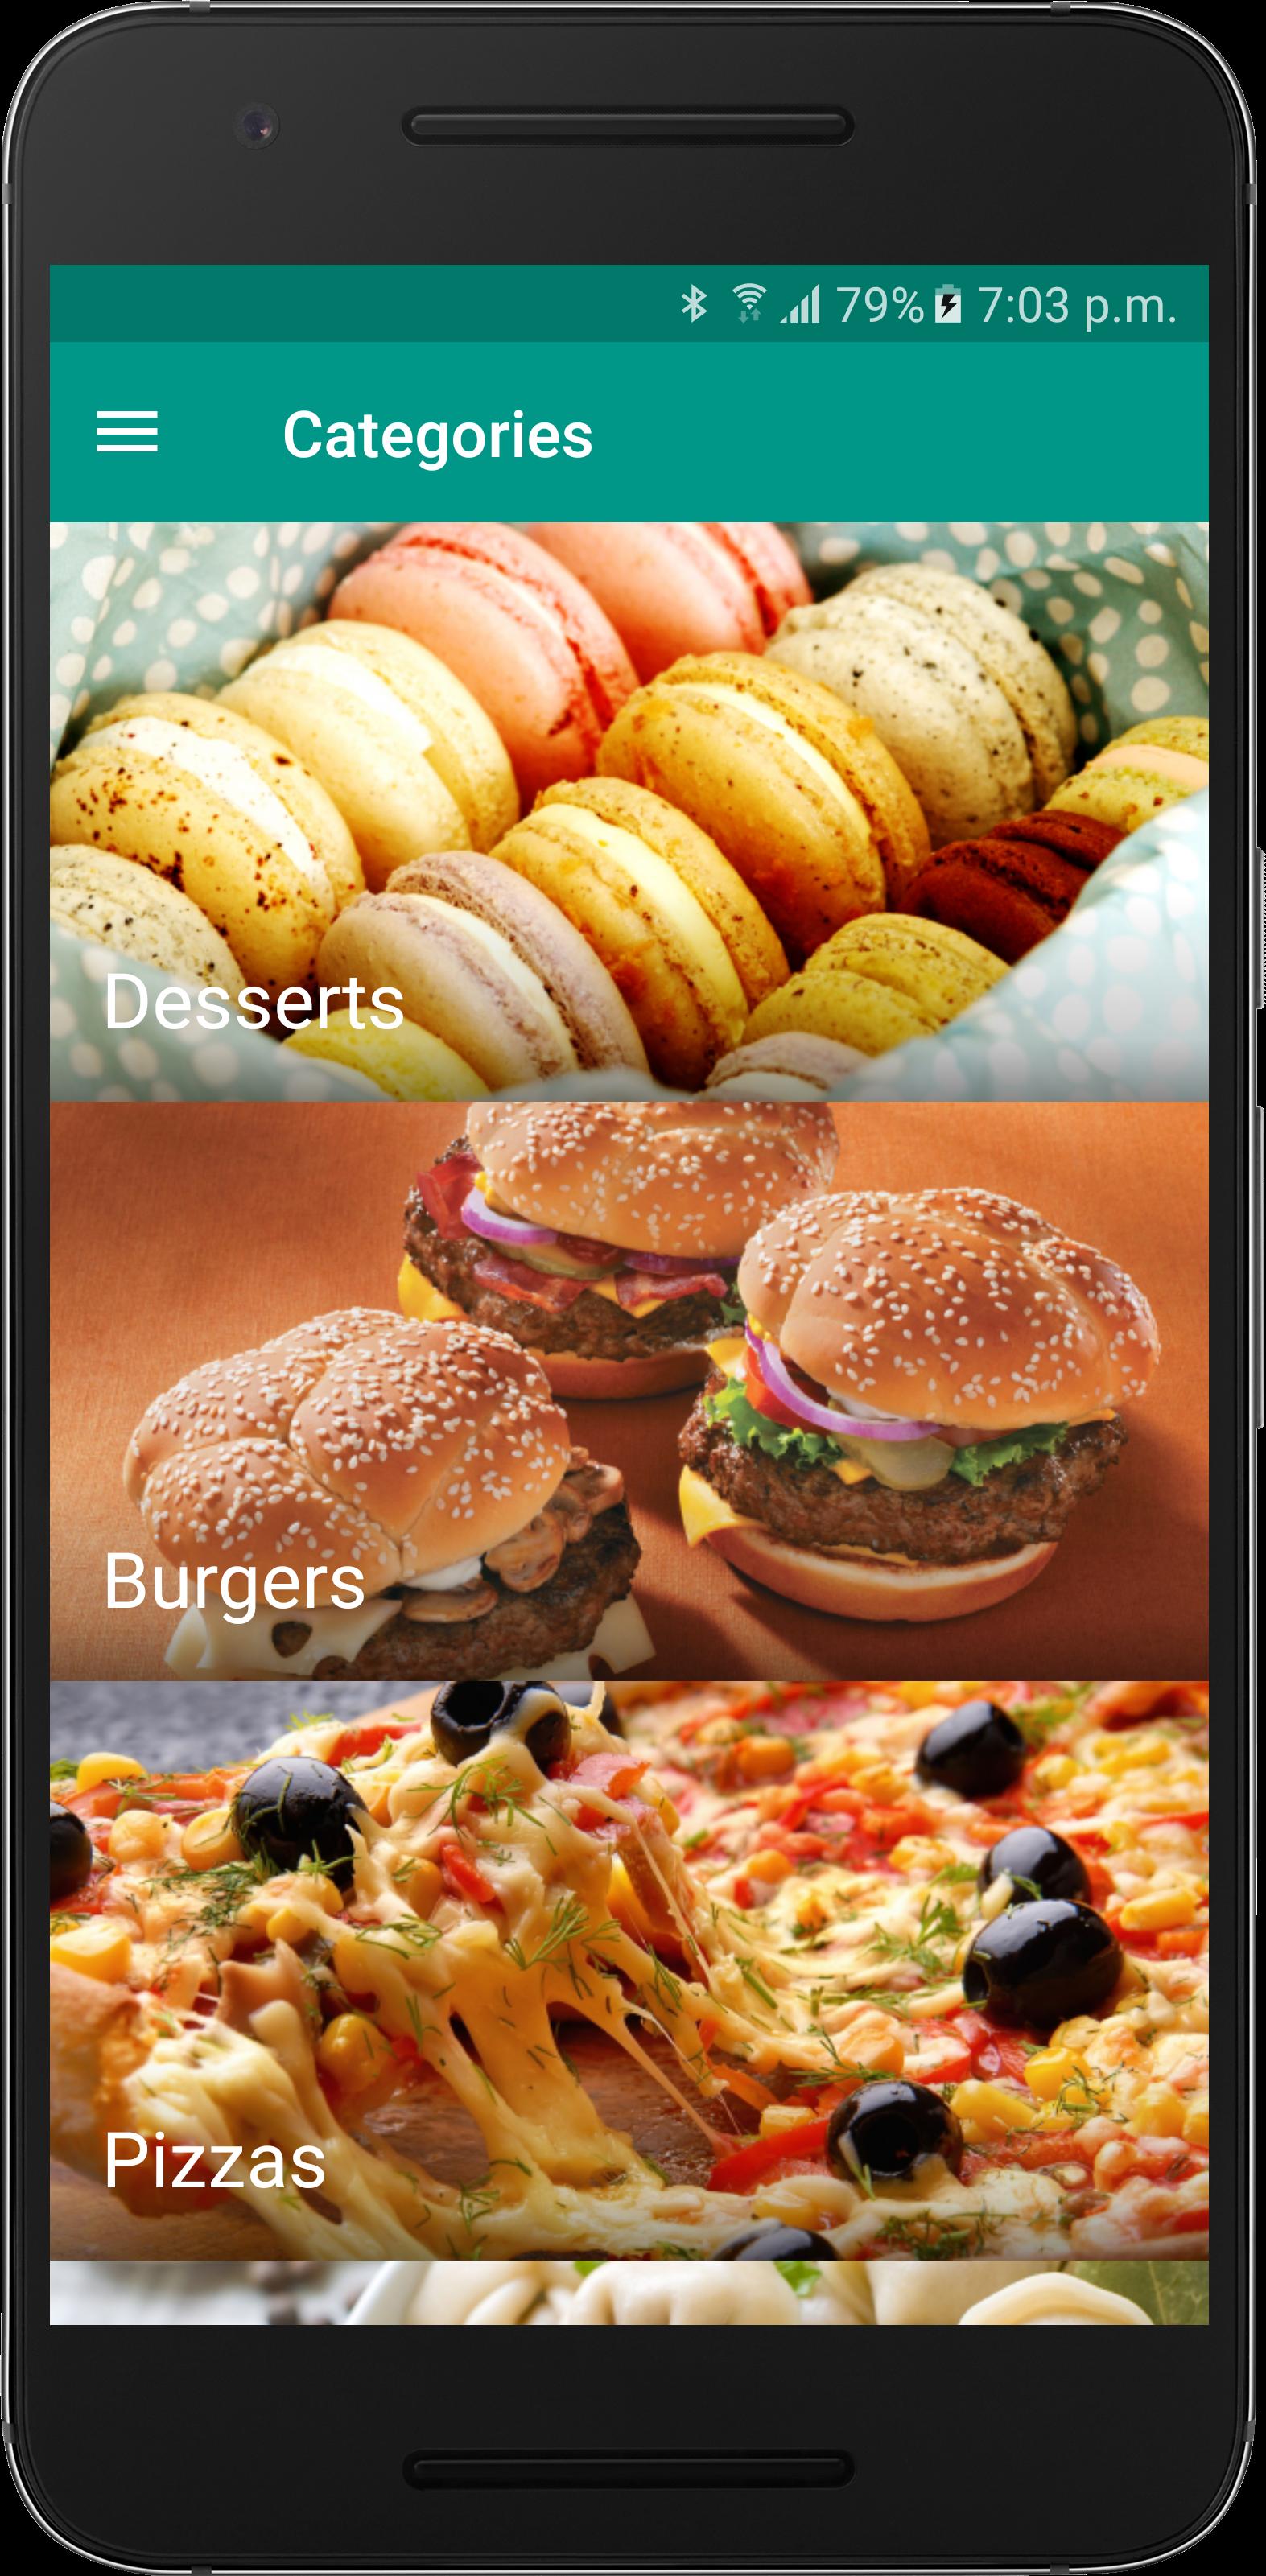 Ultimate recipe app template by neurondigital codecanyon ultimate recipe app template forumfinder Gallery